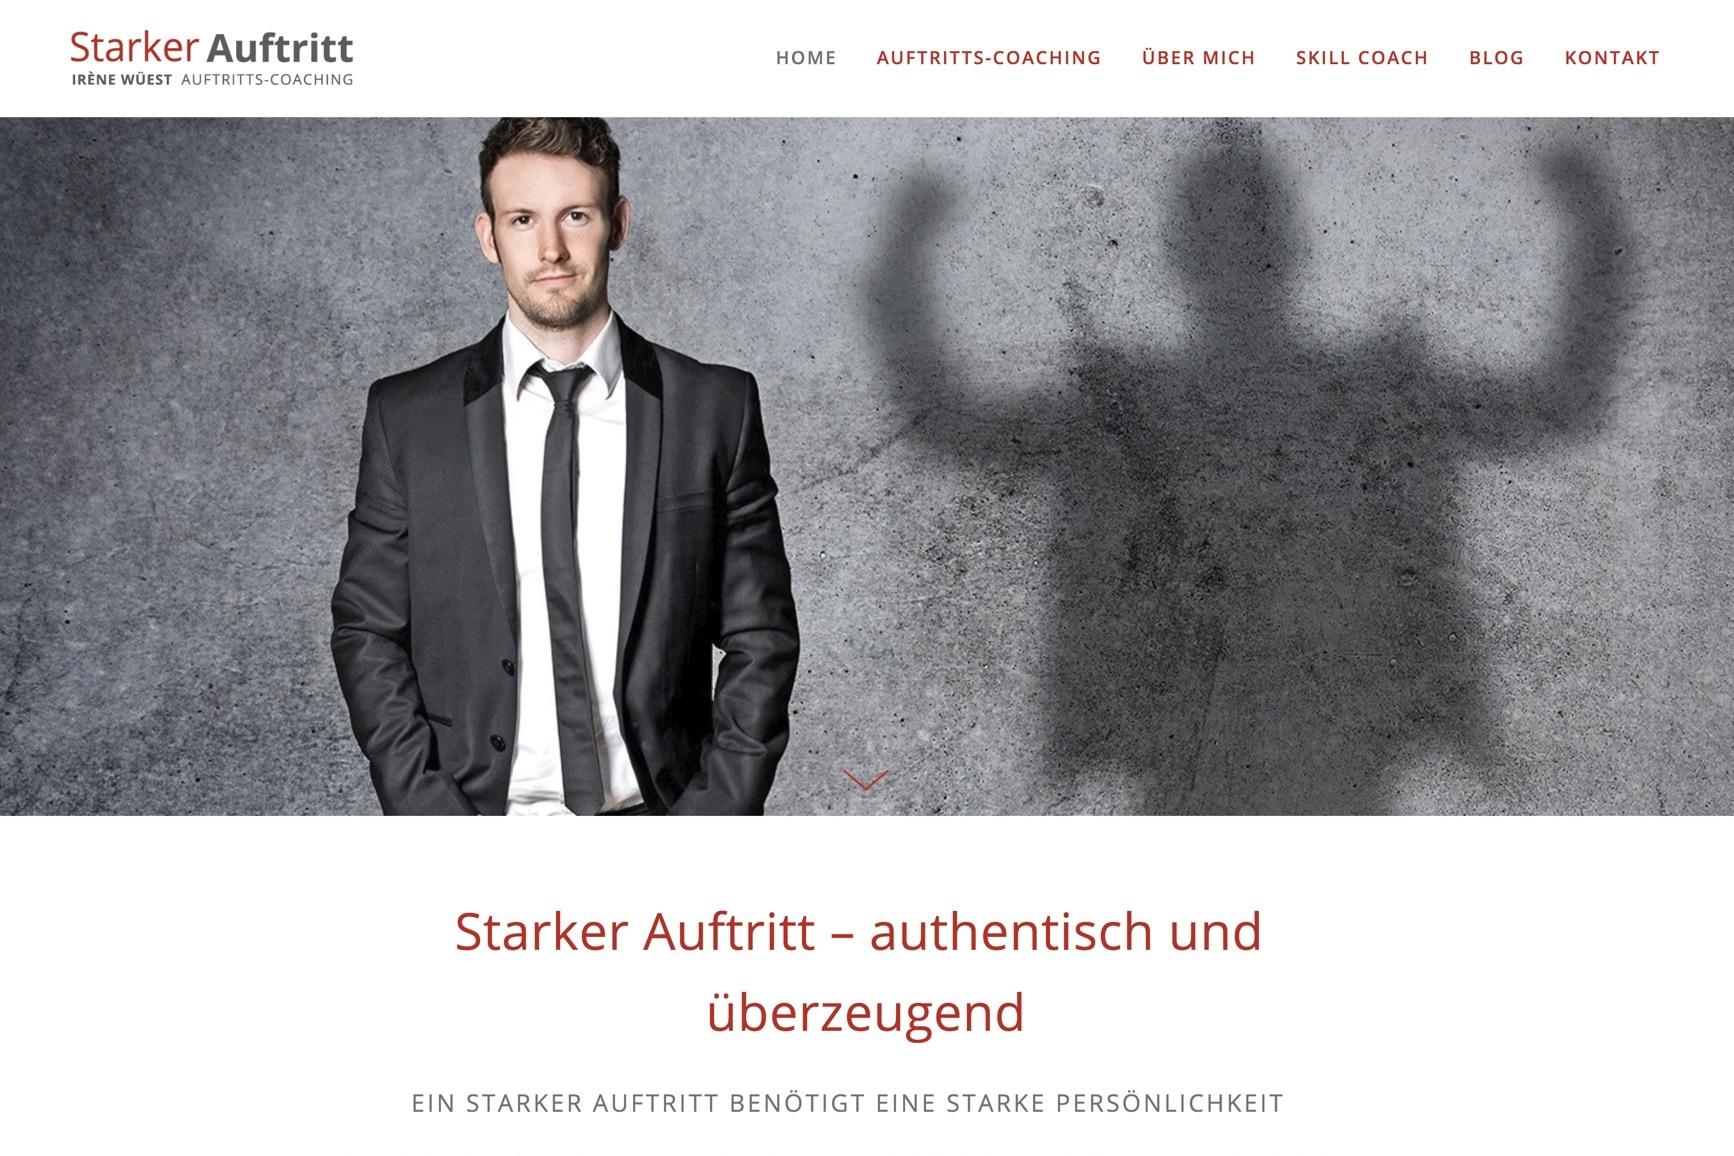 www.starkerauftritt.ch - Webdesign & Portraits